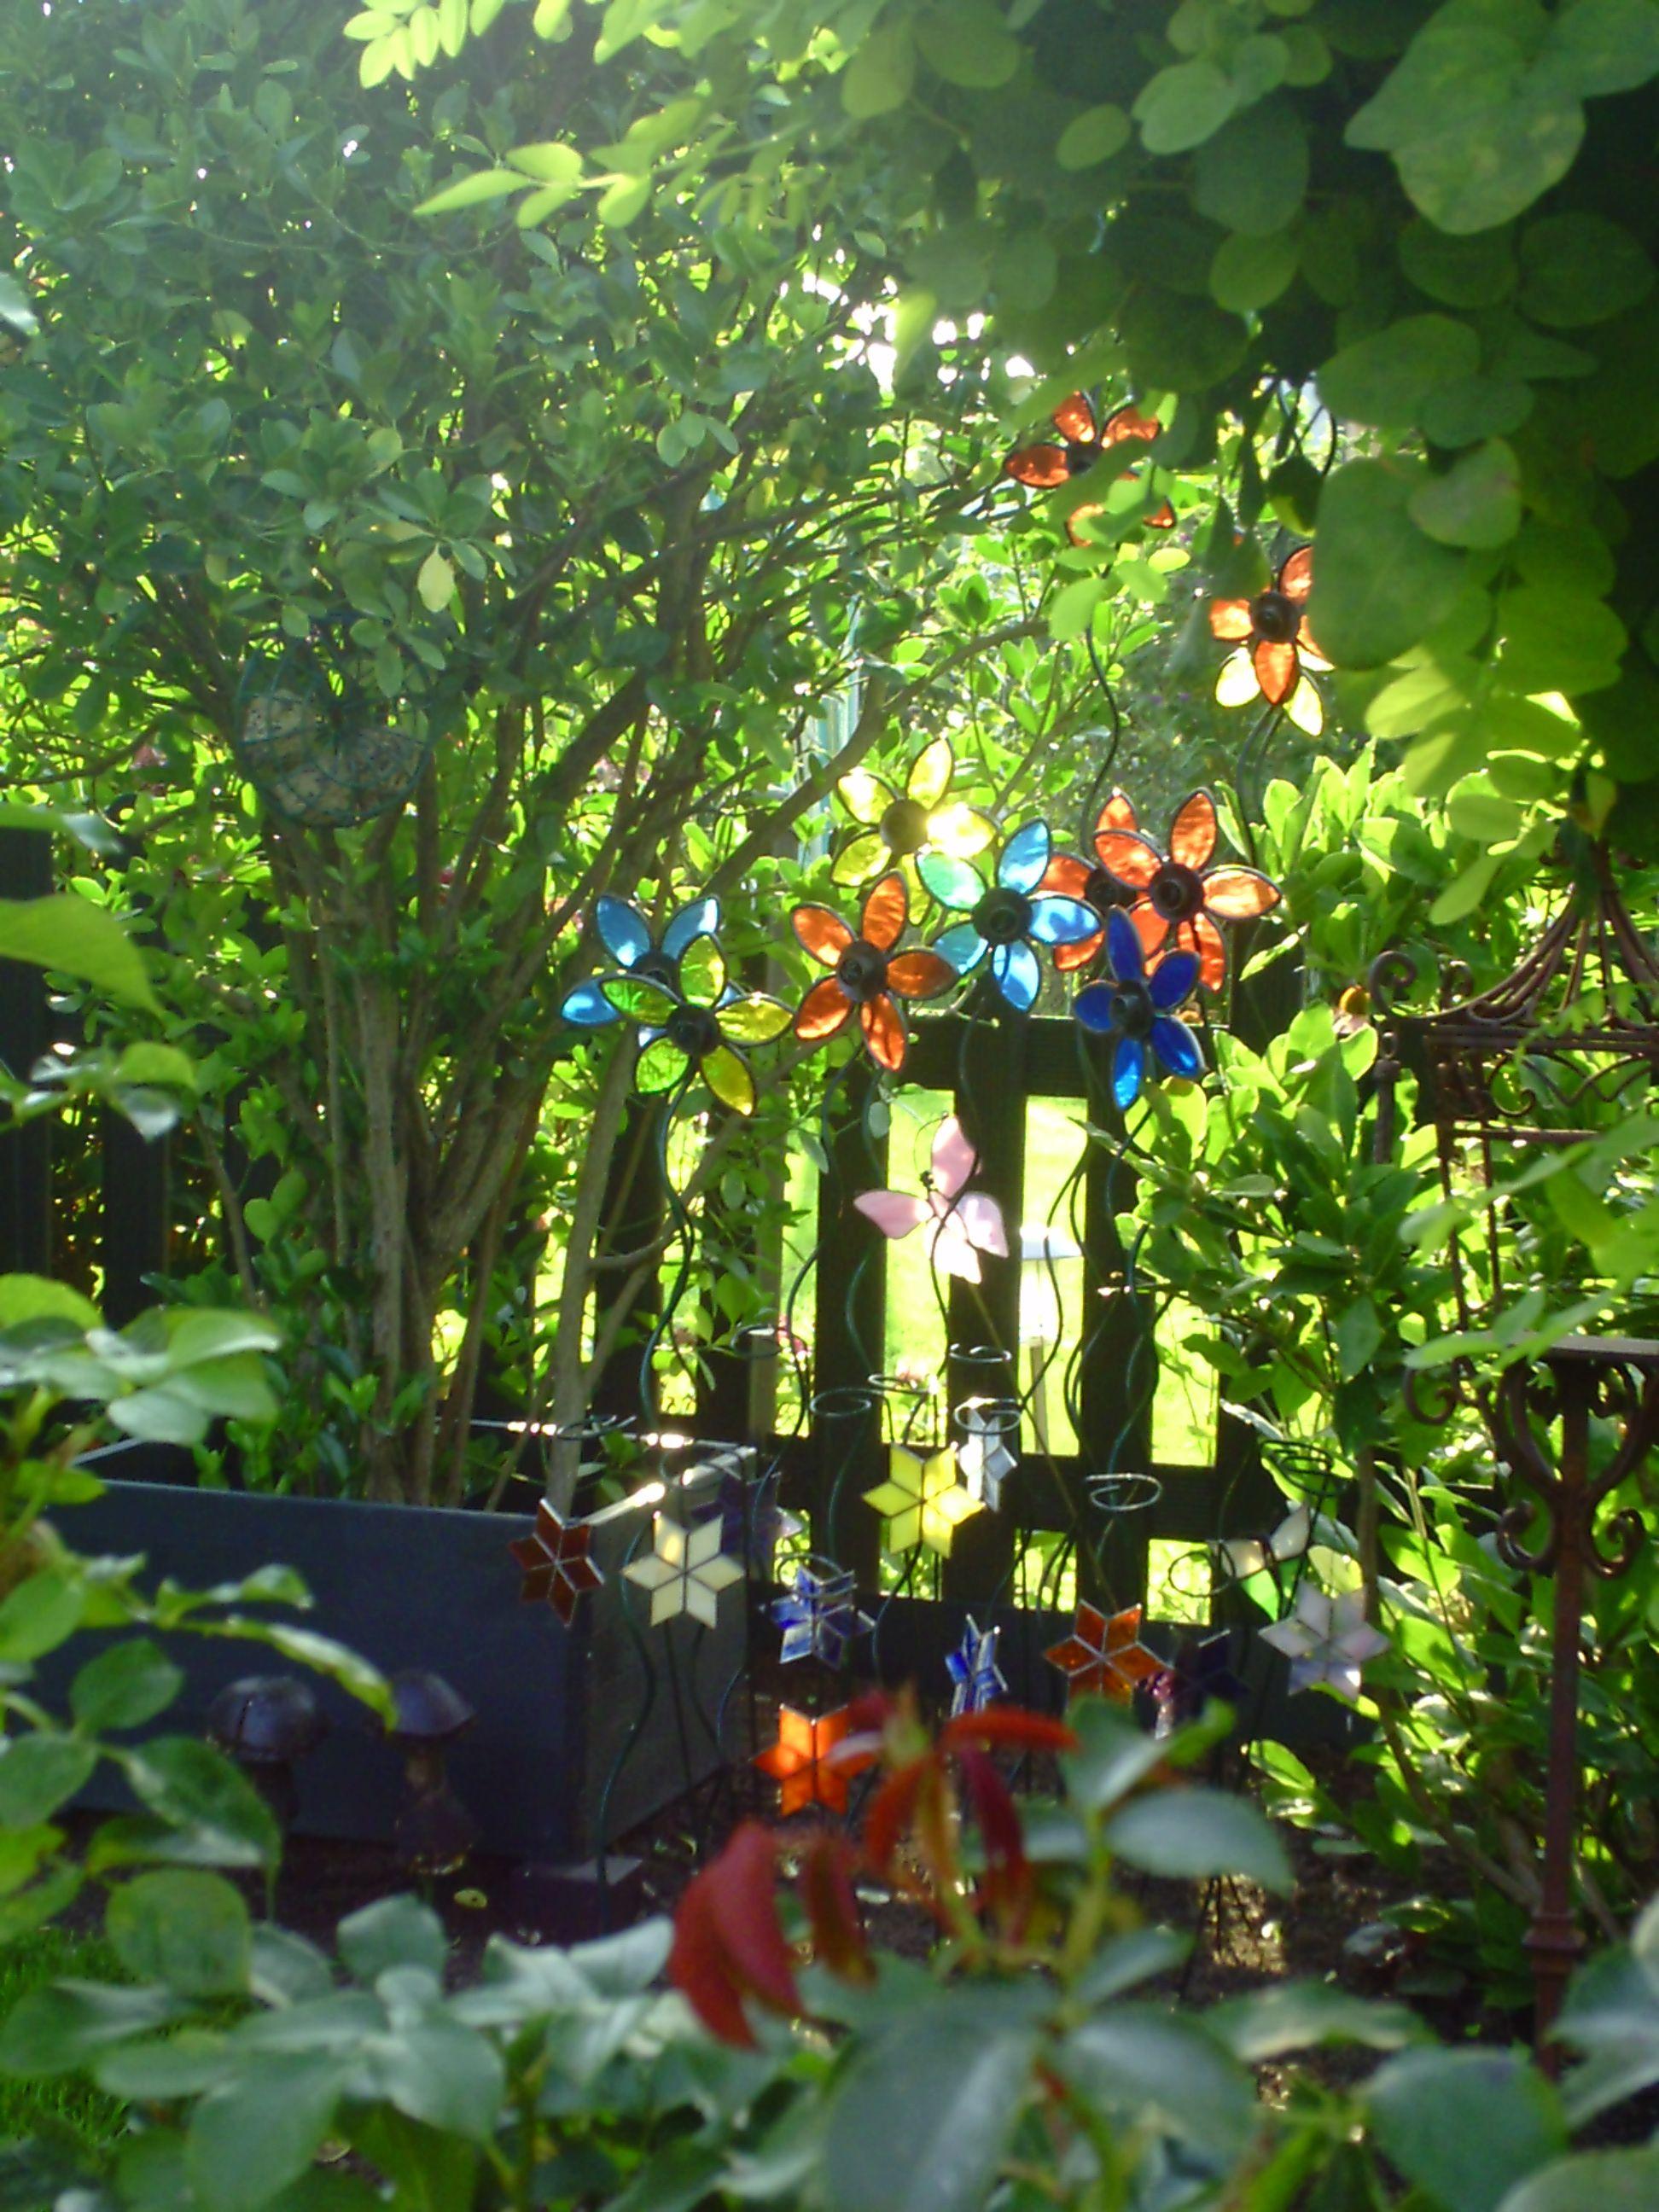 Glasblumen Blumen Garten Turkranze